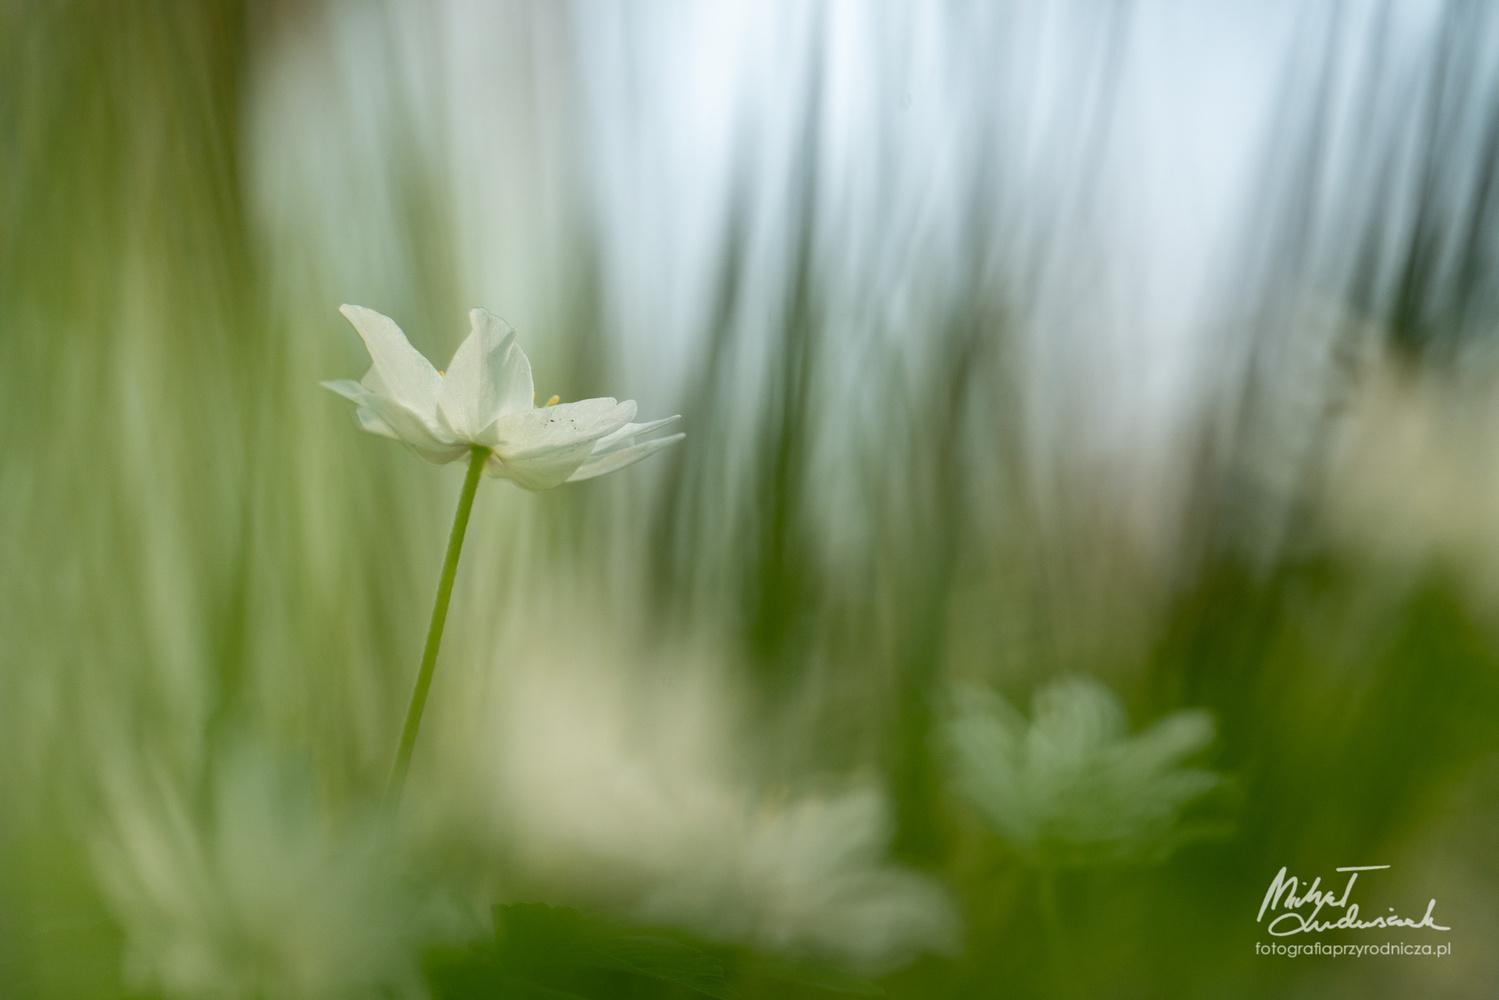 Anemone dreams by Michał Ludwiczak